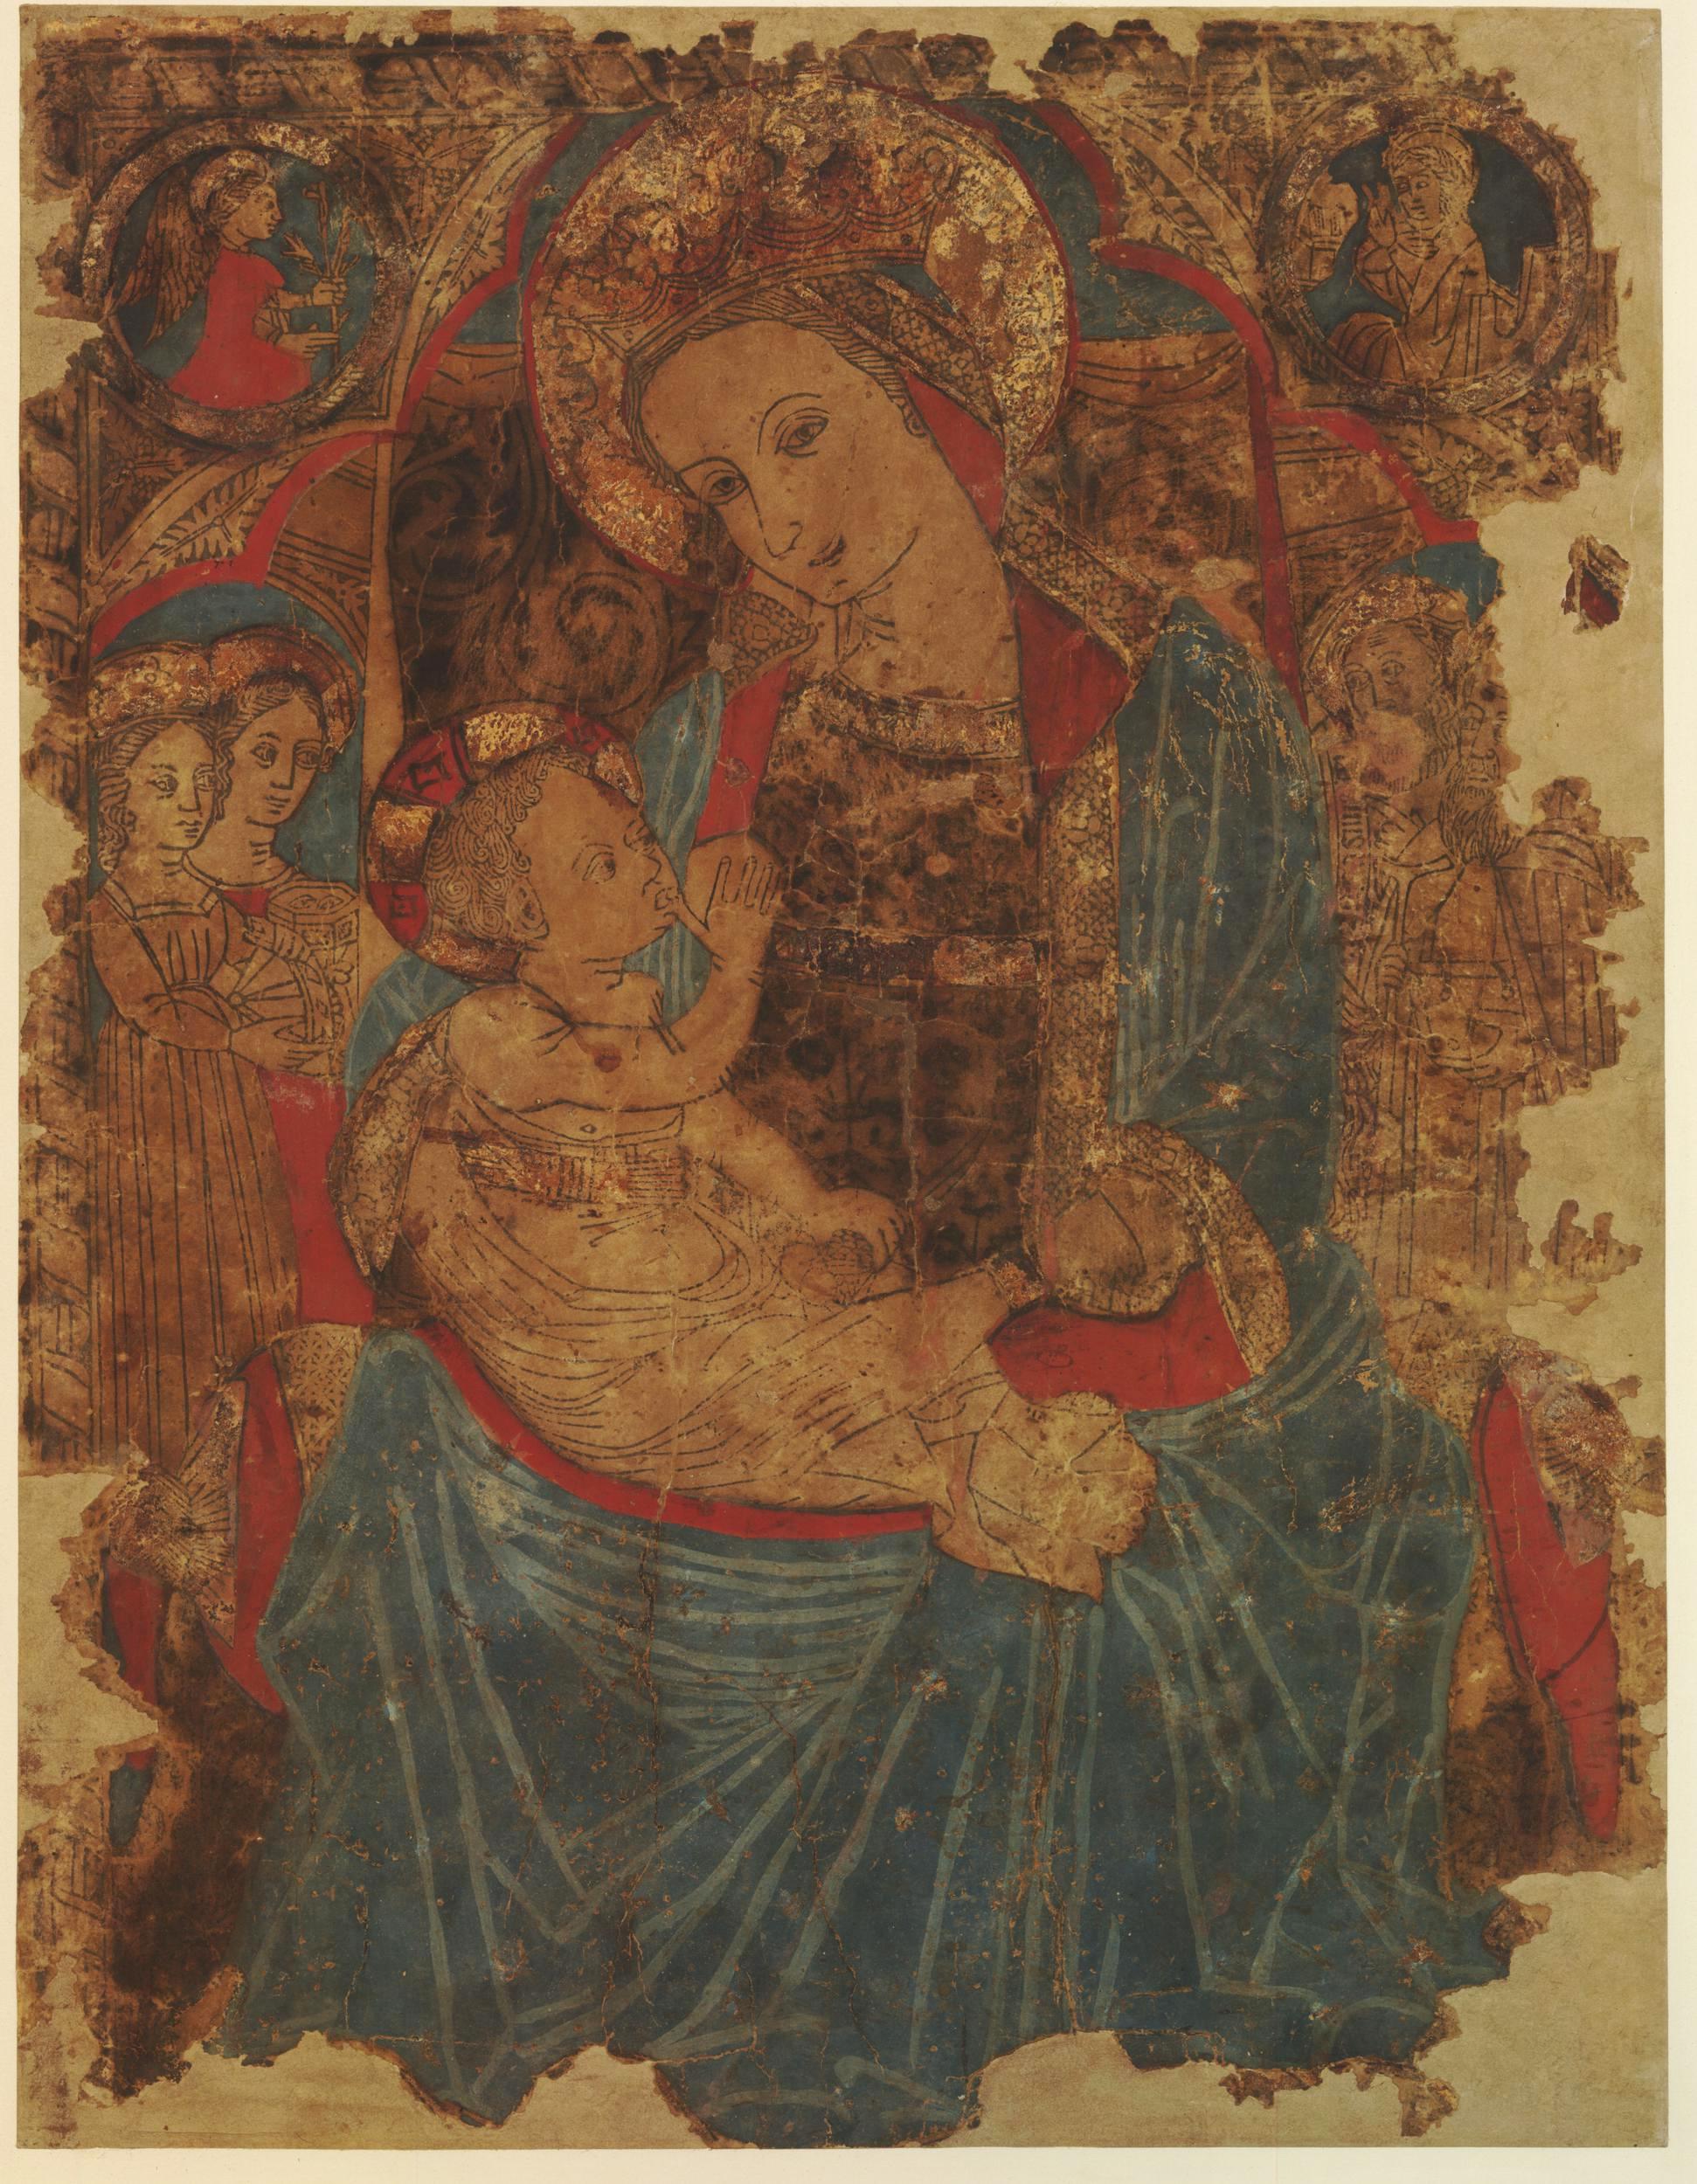 2 Italian School Virgin enthroned suckling her Child c1450 hand coloured woodcute BM